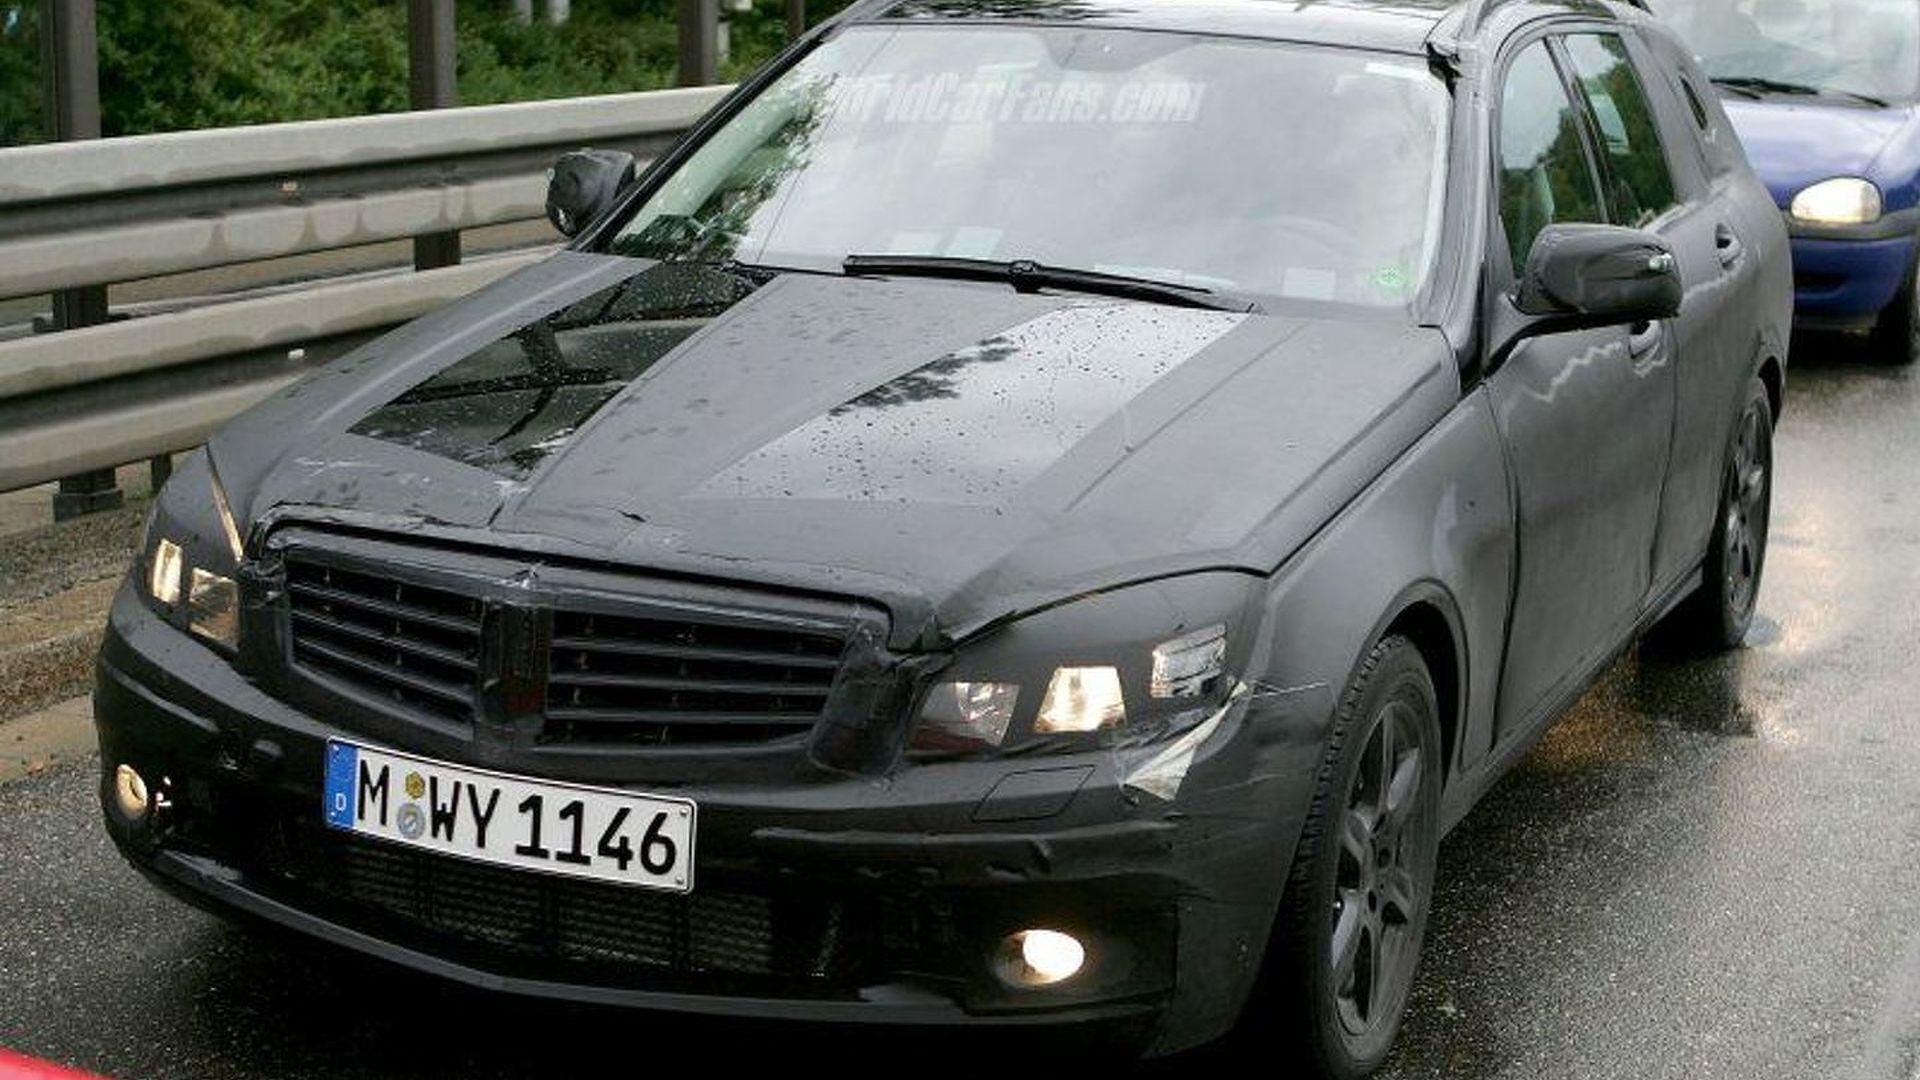 Spy Photos: More 2008 Mercedes C-Class